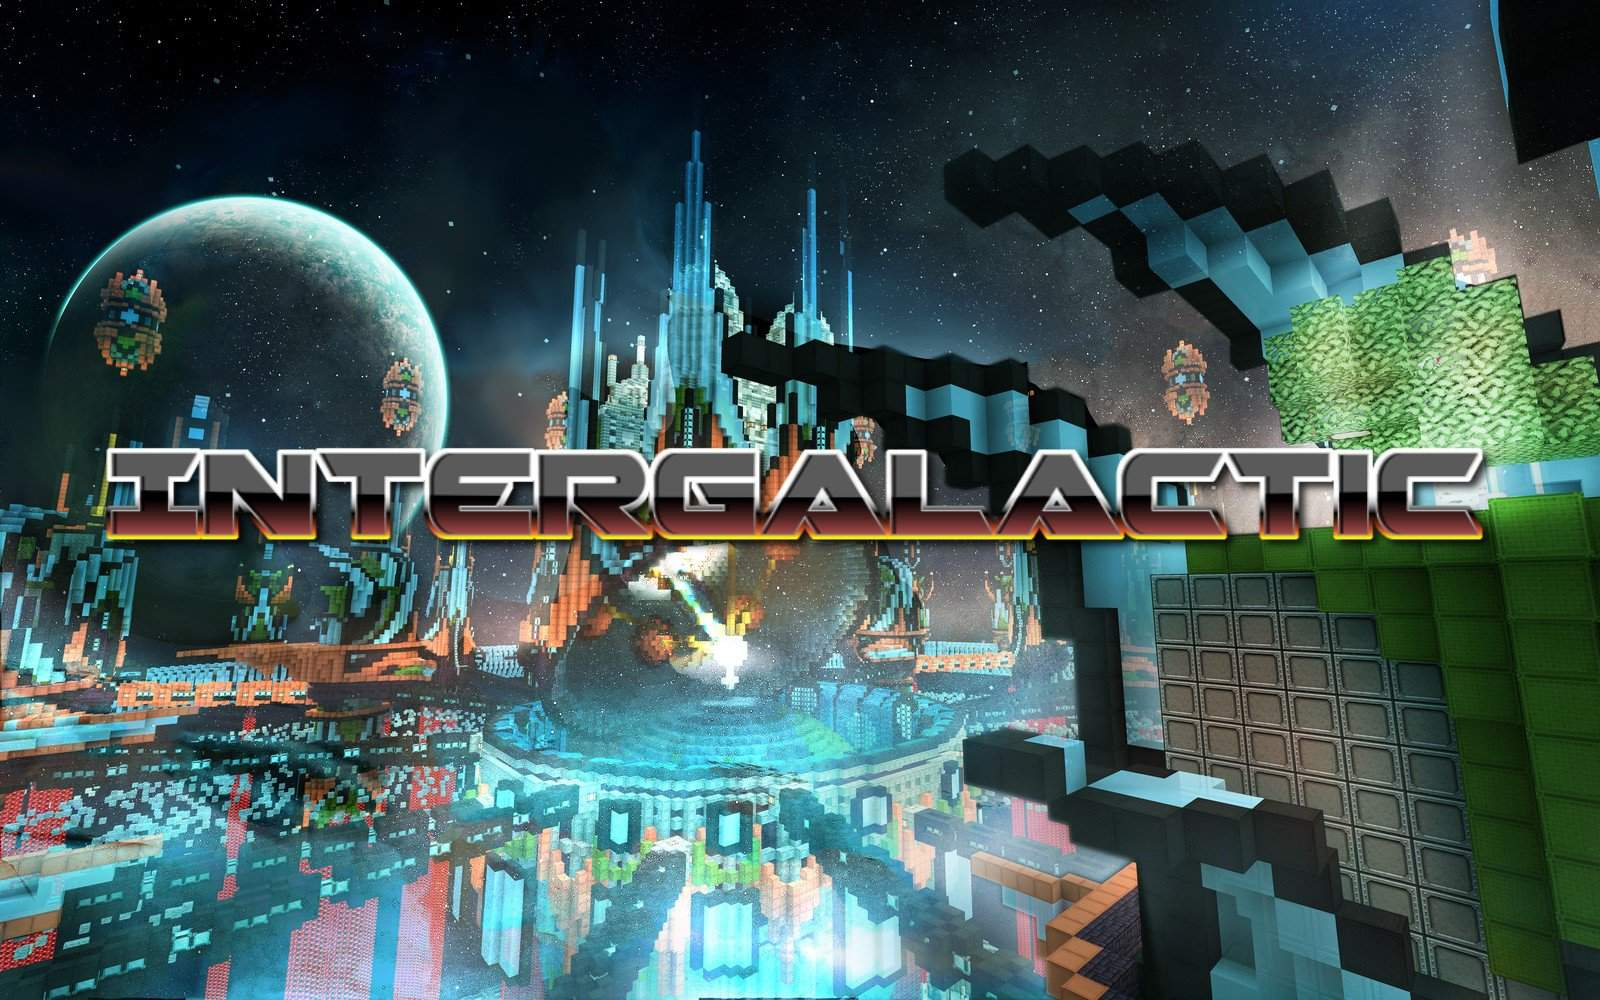 Intergalactic map for minecraft 111 minecraftsix gumiabroncs Choice Image